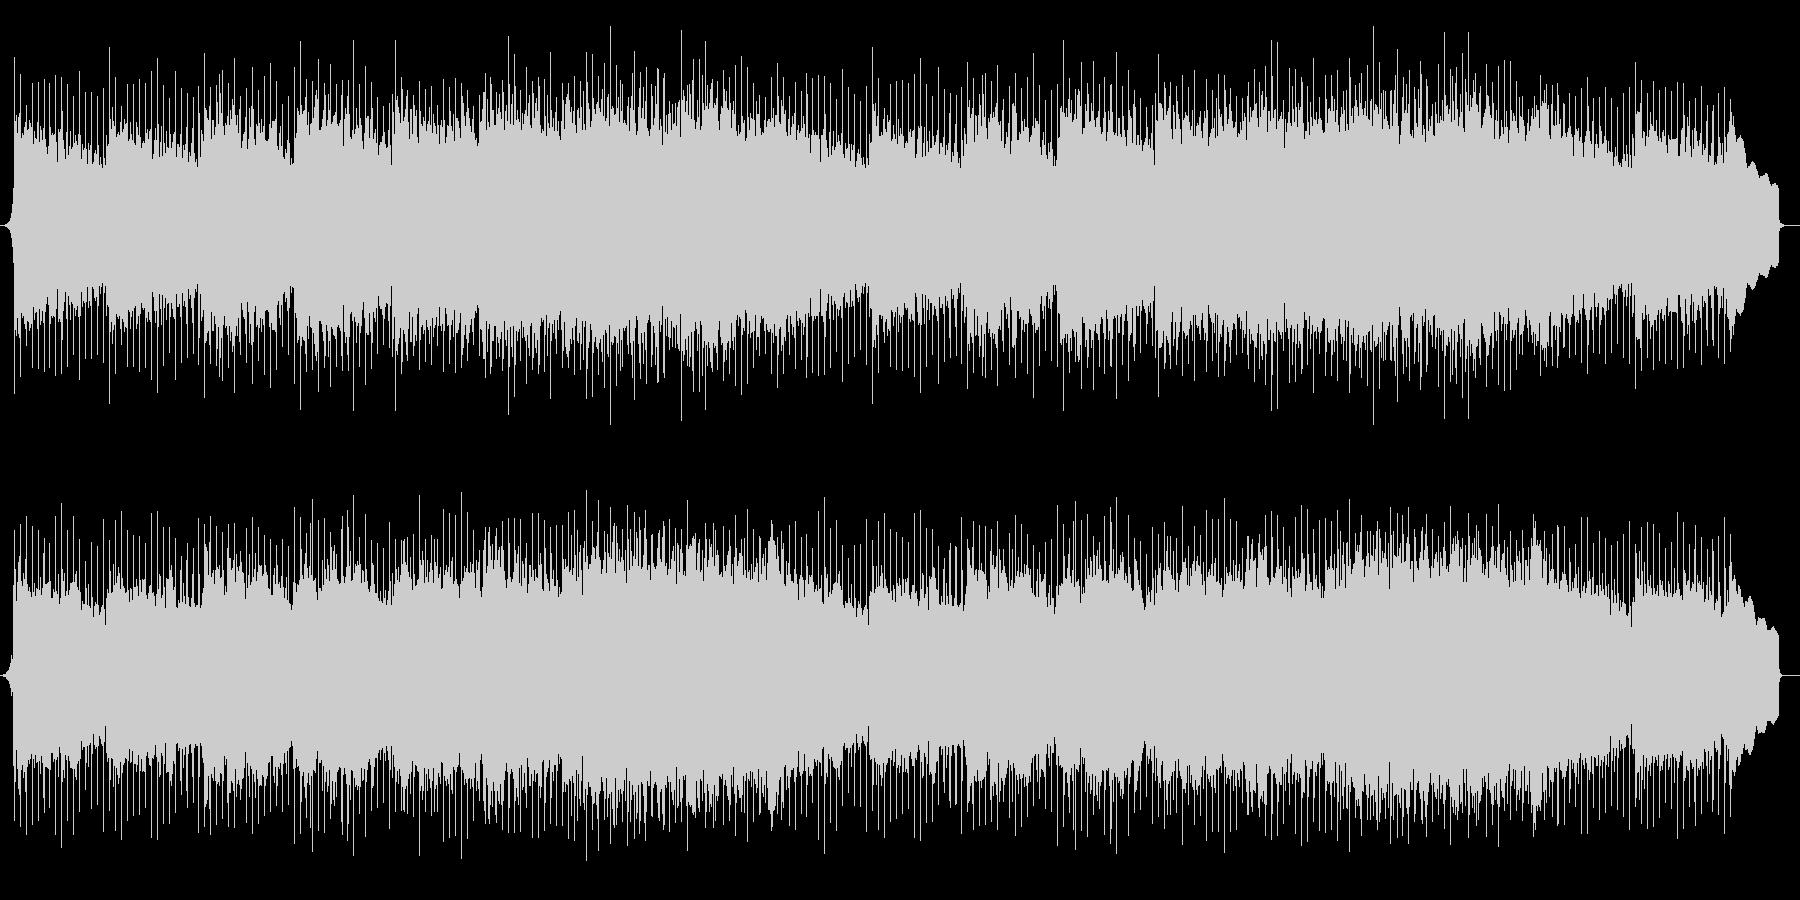 「Happier」 Acoustic Guitar Pop's unreproduced waveform